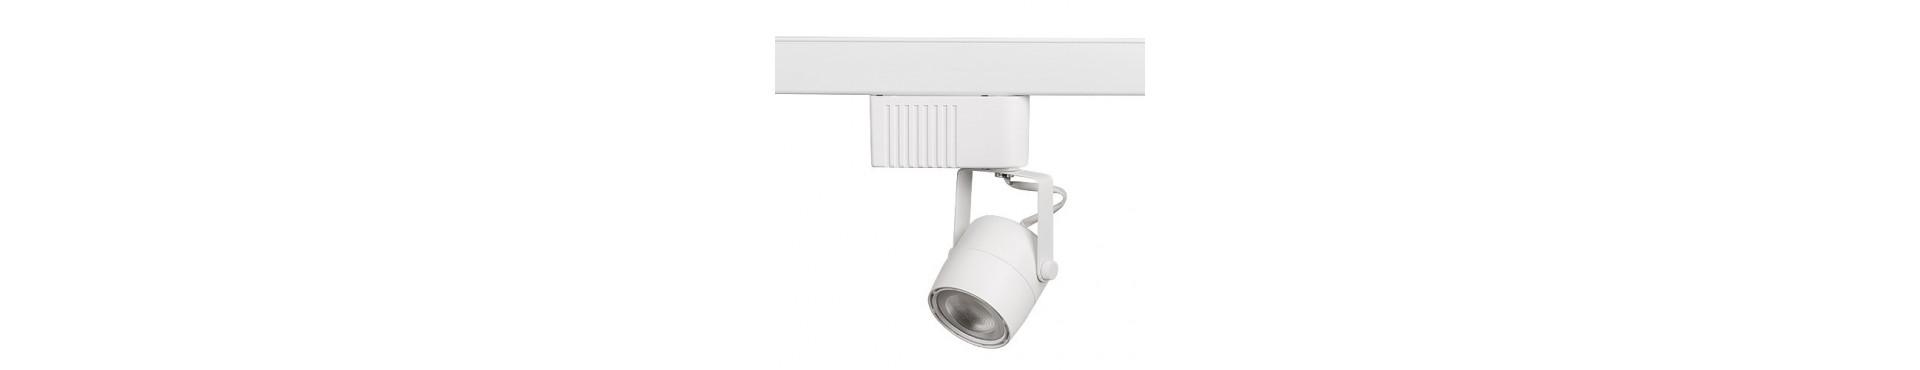 LED track light - LED butiksbelysning